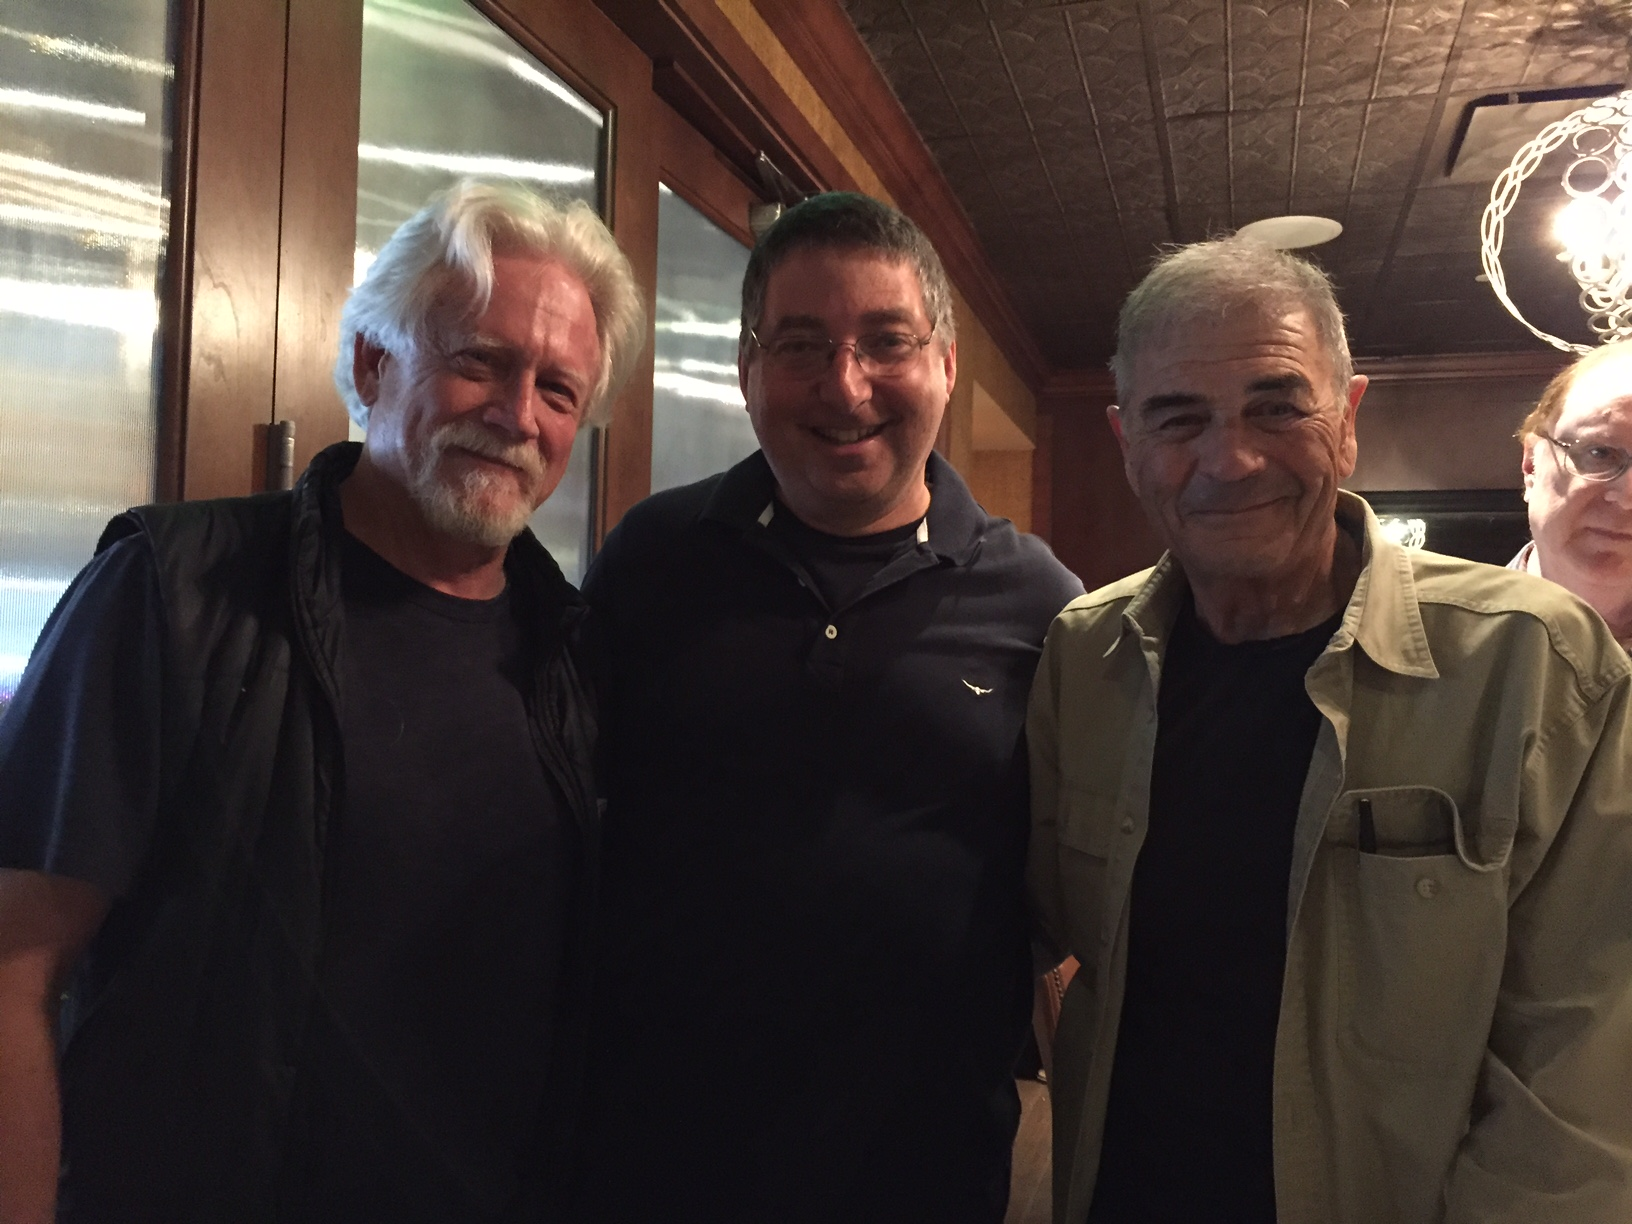 Bruce Davison, Lee, and Robert Forster